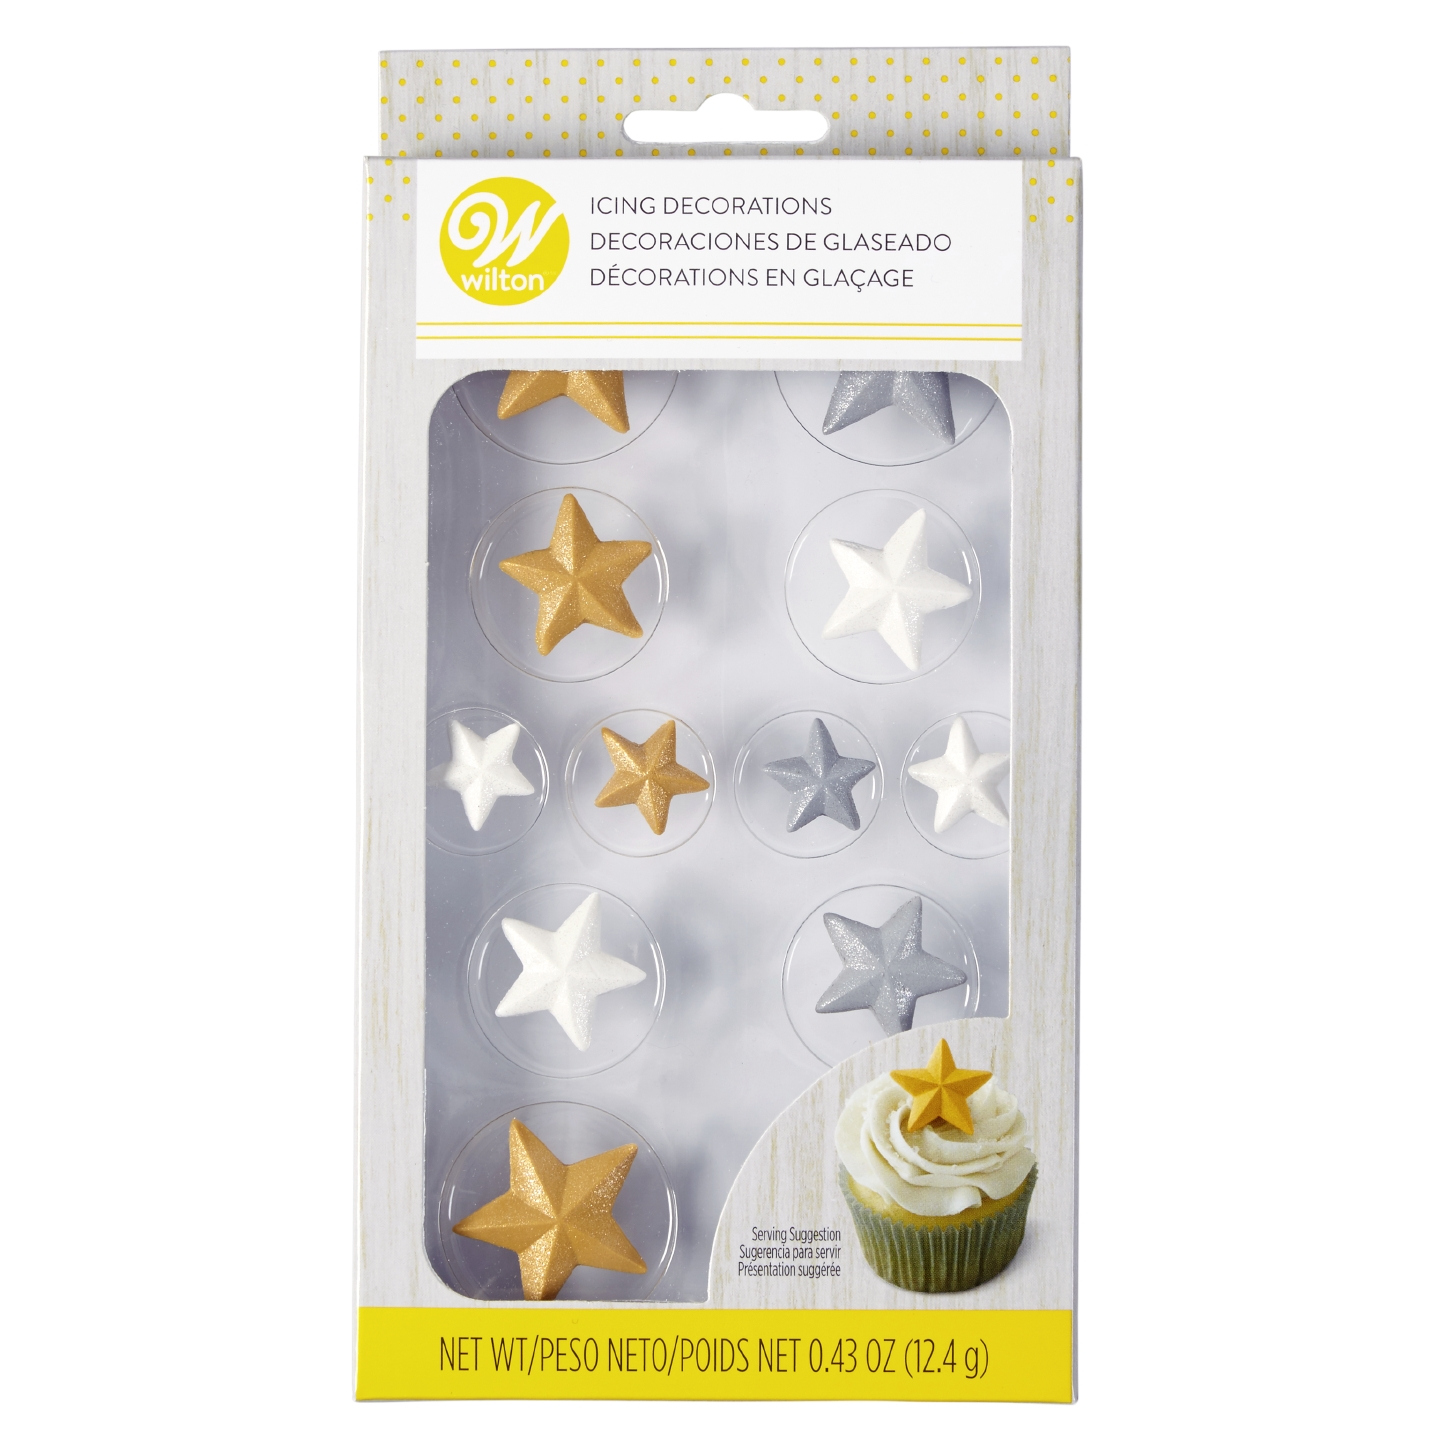 Wilton Metallic Star Royal Icing Decorations, 12ct